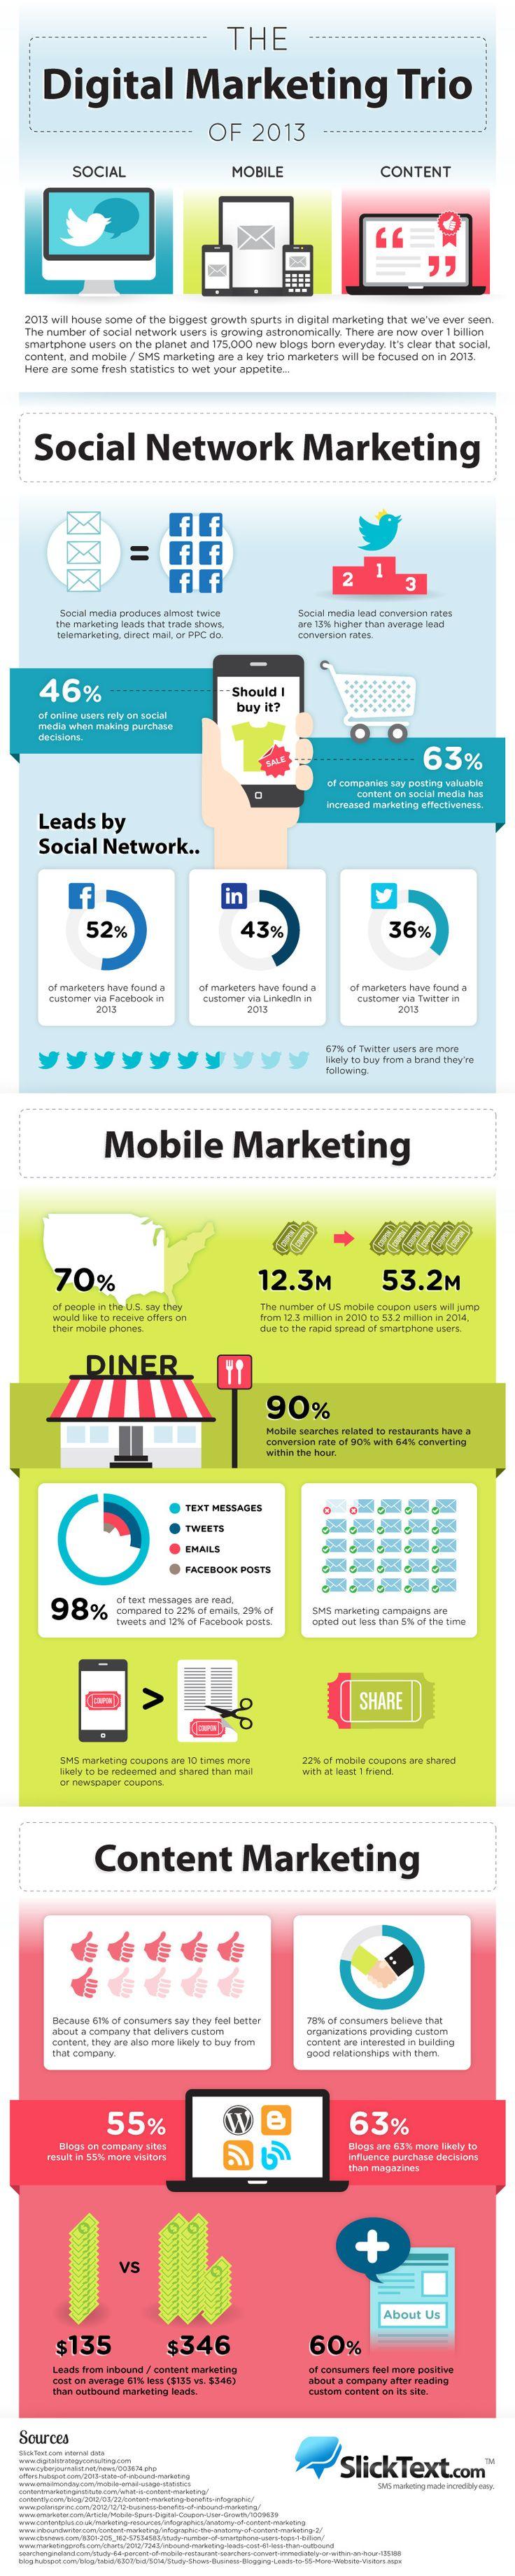 The Digital Marketing Trio Of 2013   Business 2 Community